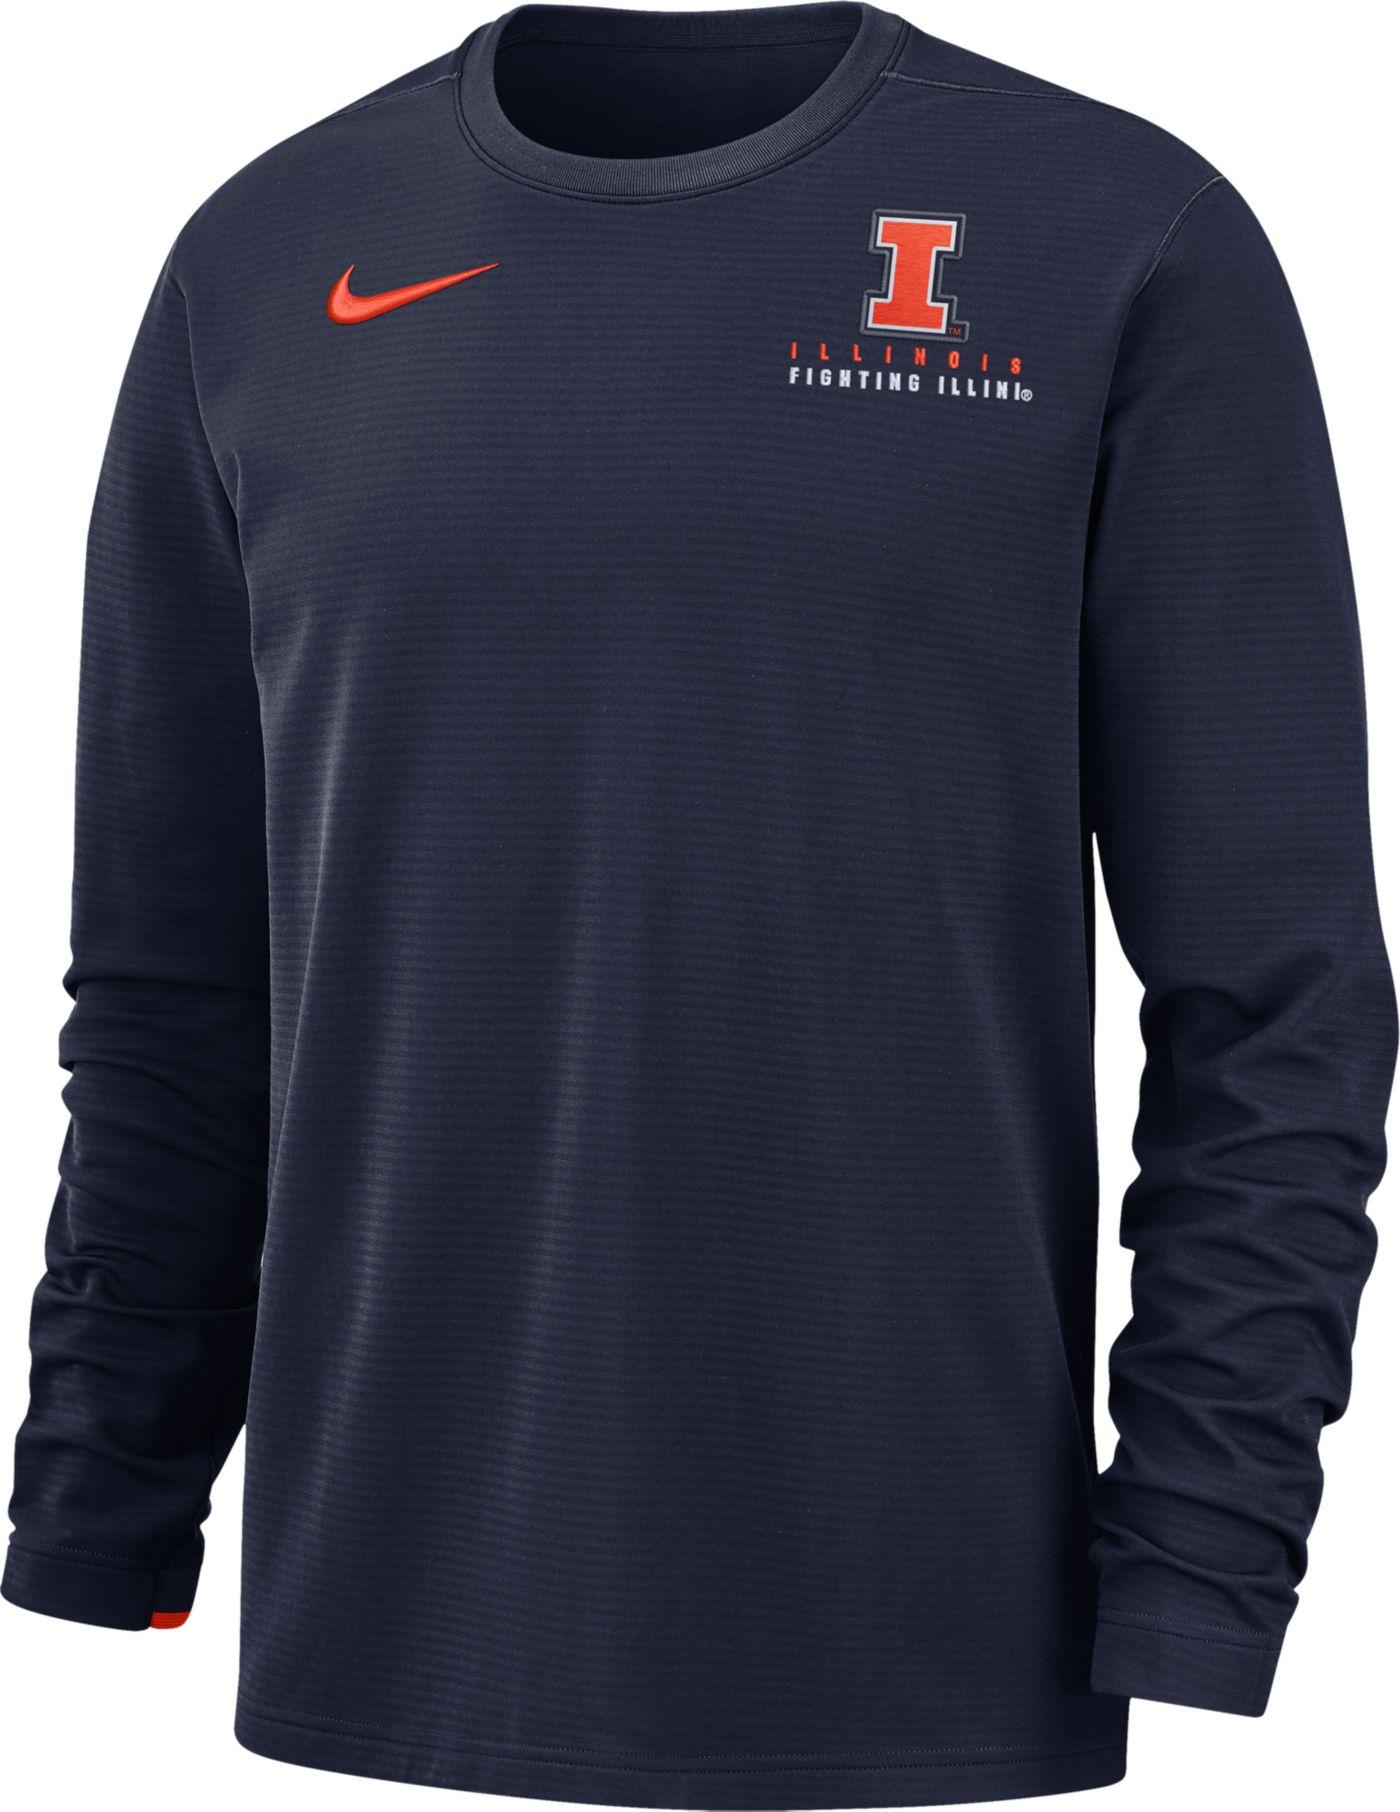 Nike Men's Illinois Fighting Illini Blue Dri-FIT Modern Long Sleeve Crew Neck T-Shirt